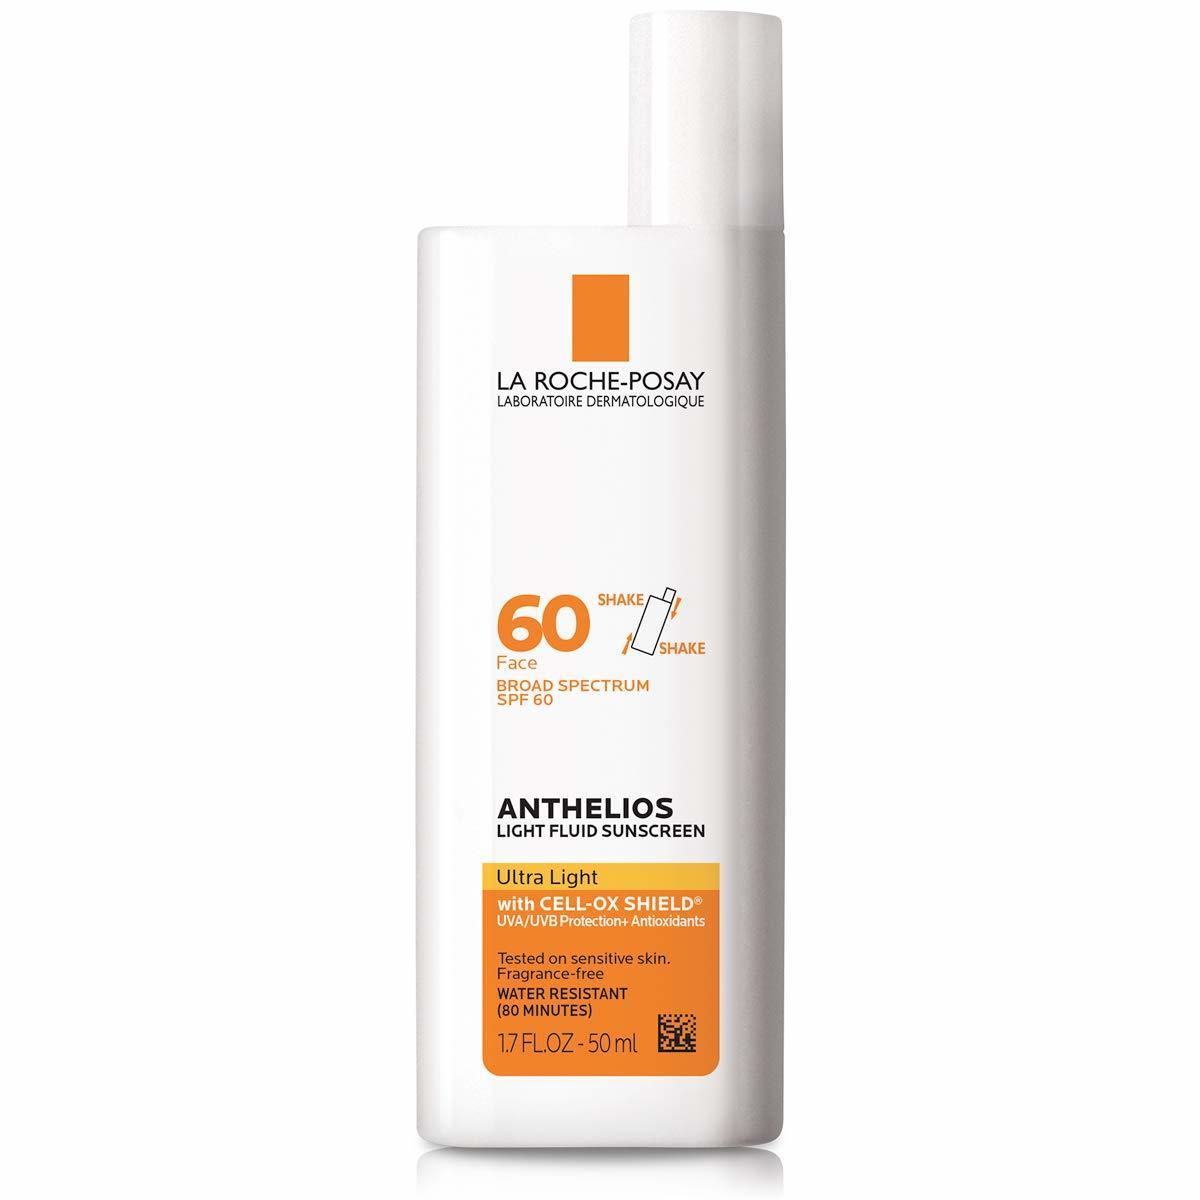 1. La Roche-Posay Anthelios 60 Ultra Light Sunscreen Fluid